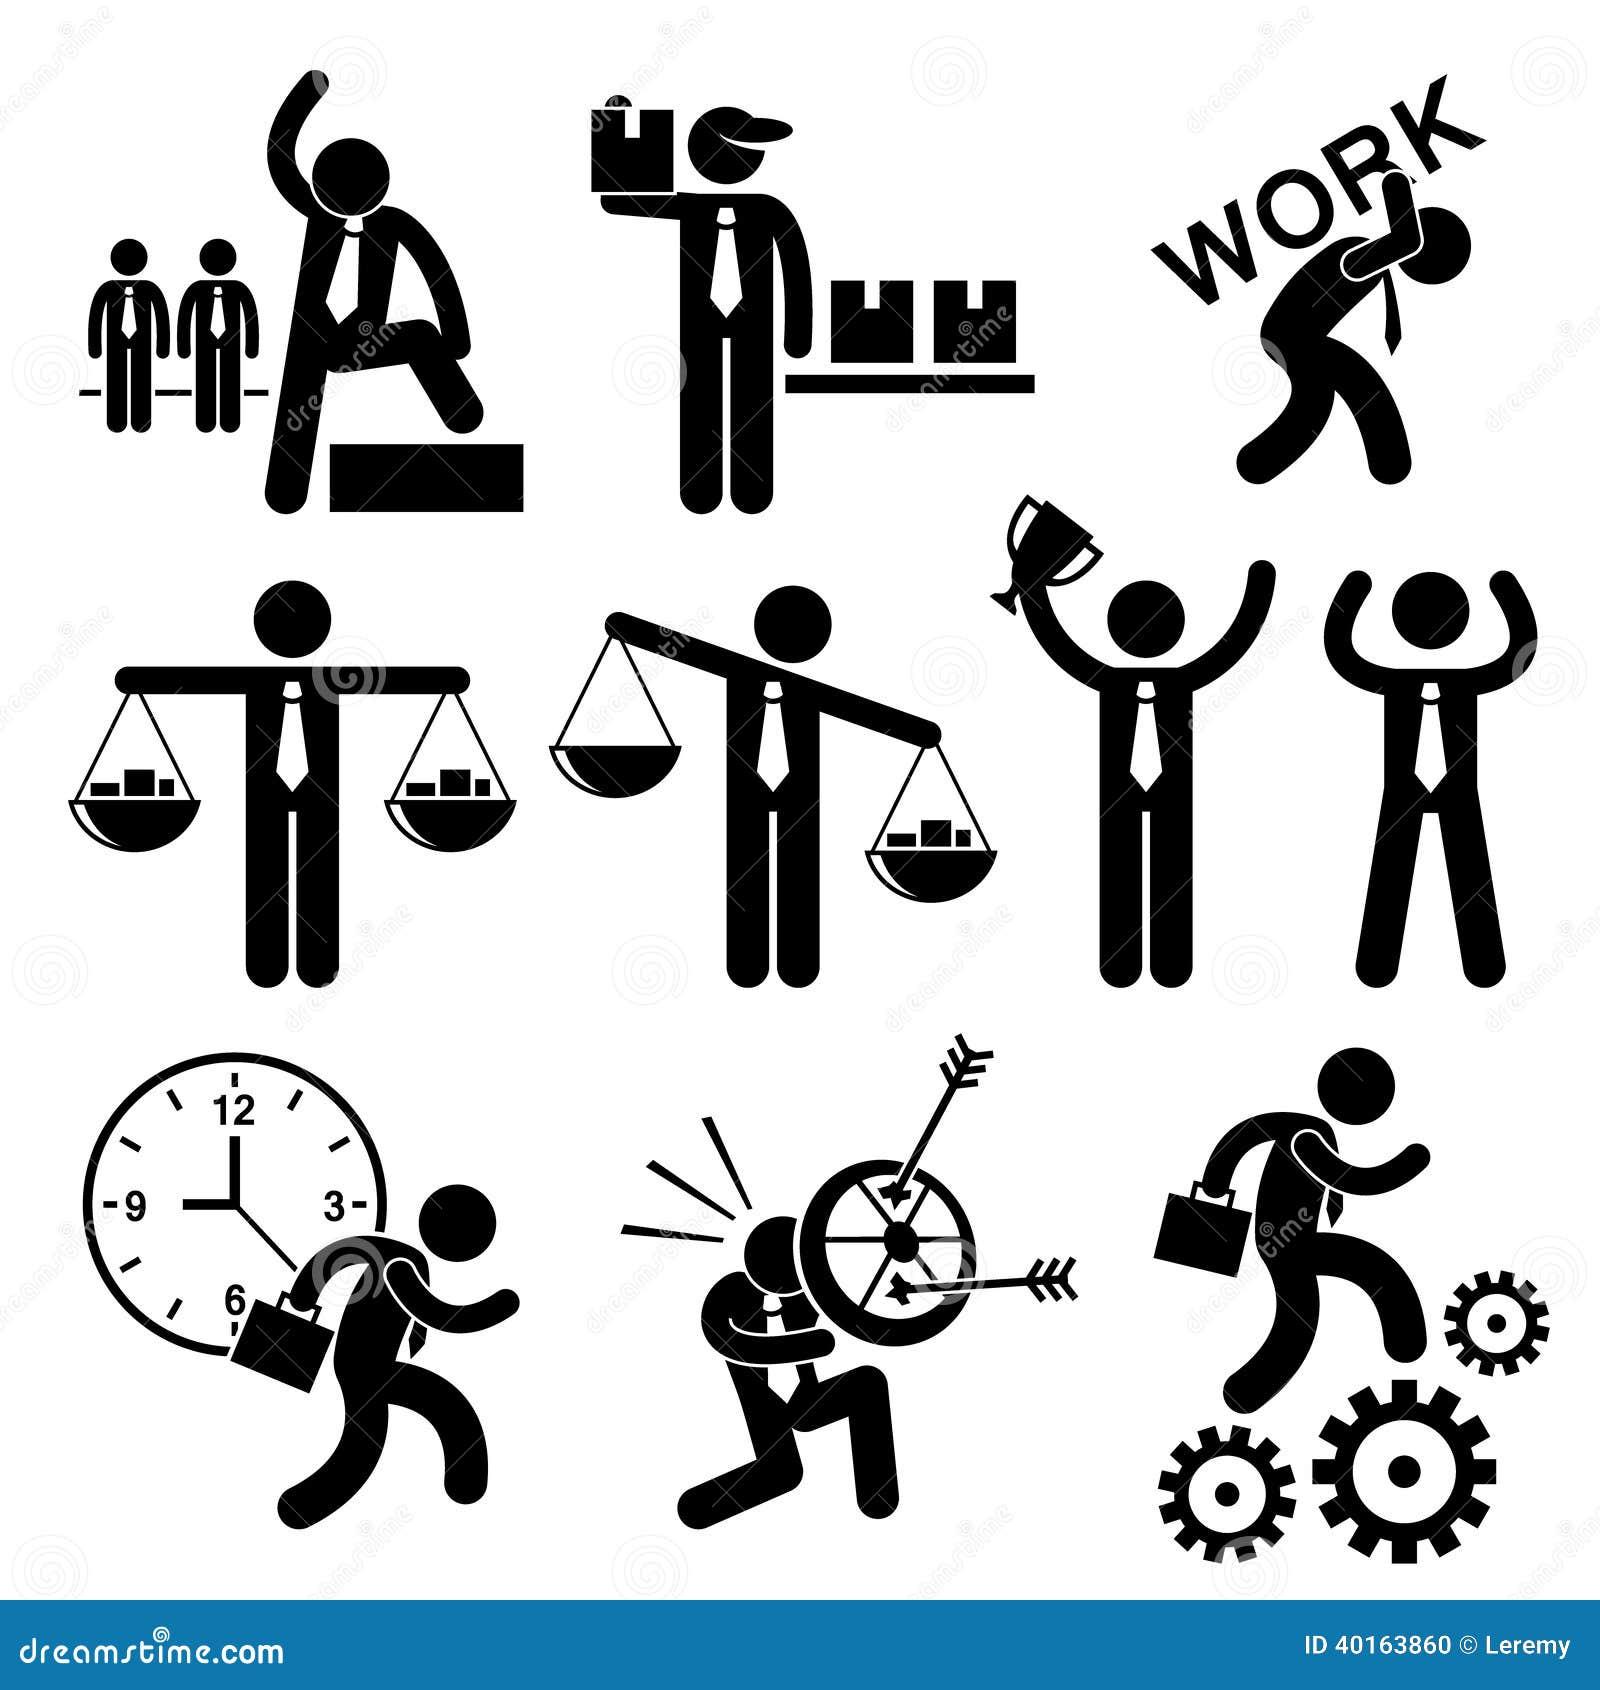 stick figure concept affaires icon businessman cliparts homme pictogram affari gens human gente uomo dell running vecteur shutterstock suit vector